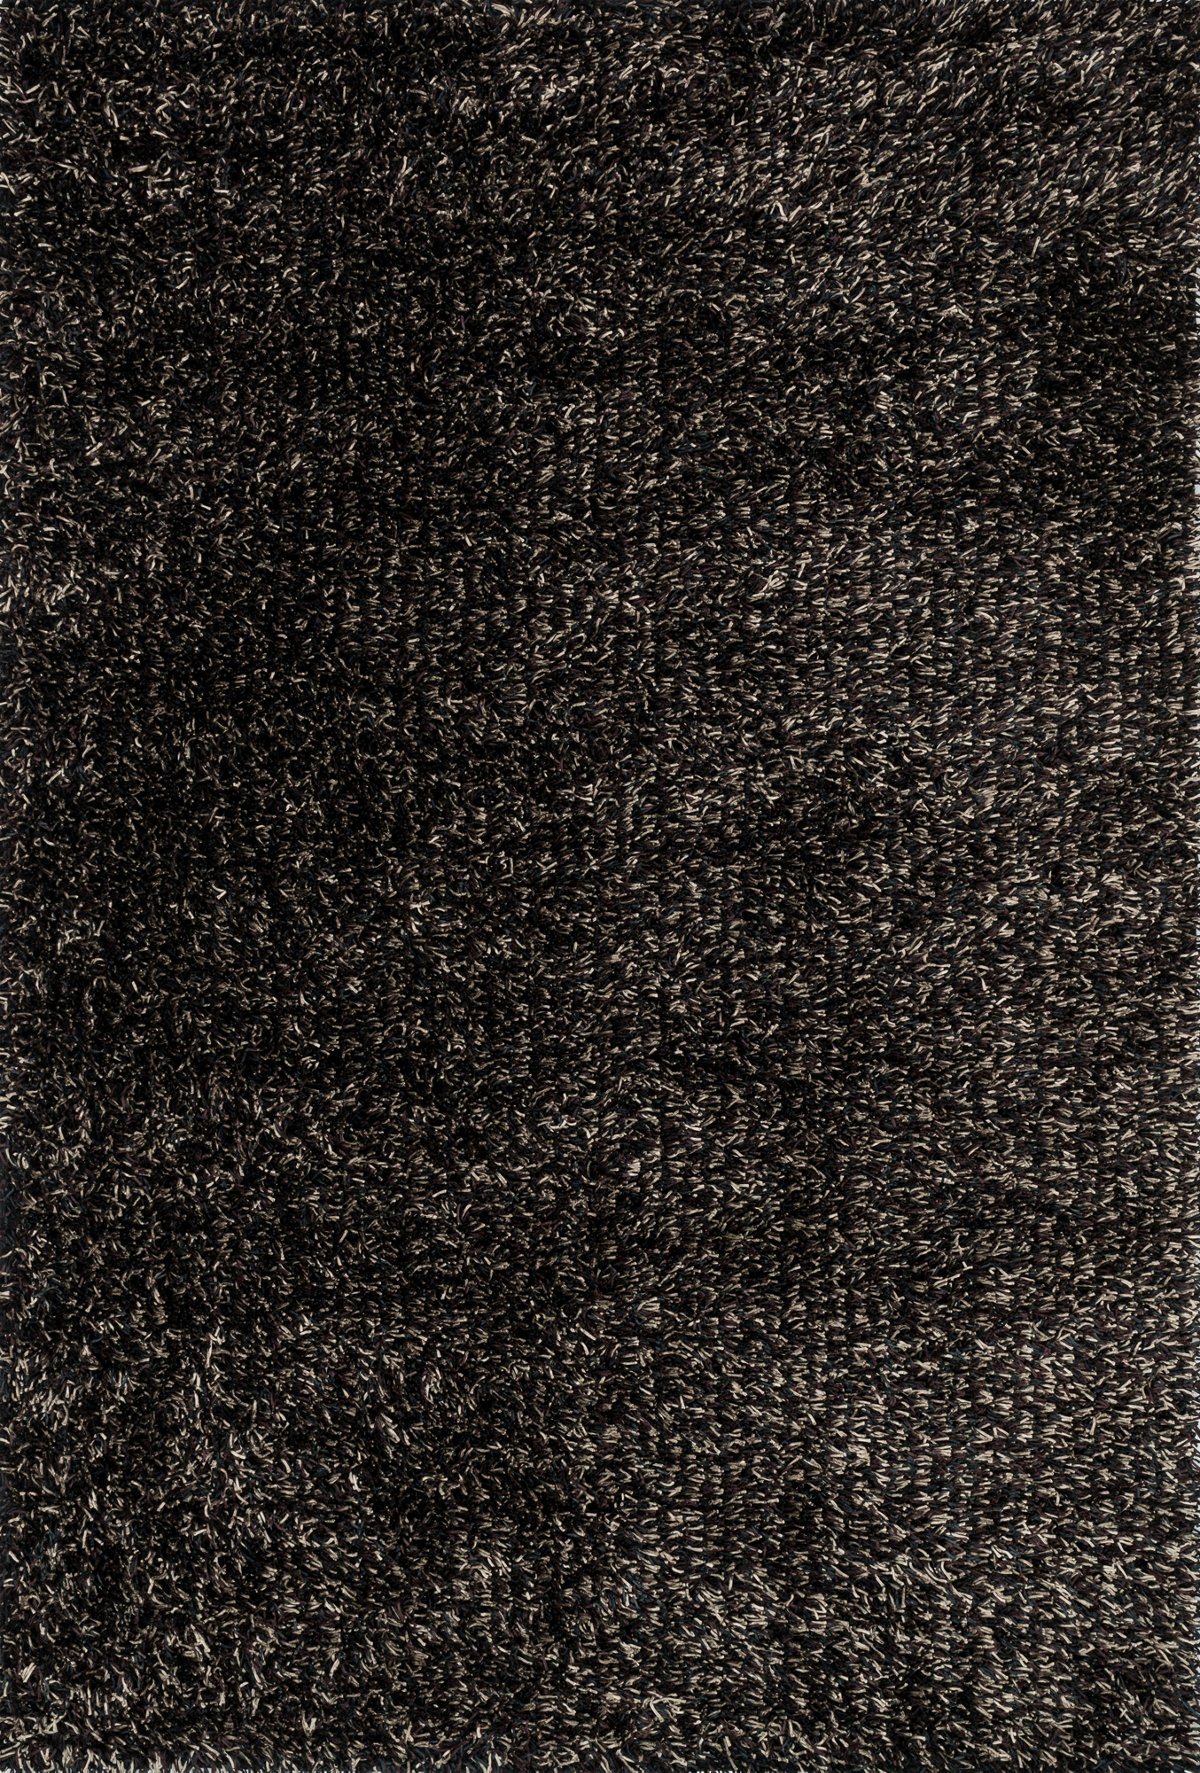 Carrera Black Poly 5x8 Area Rug